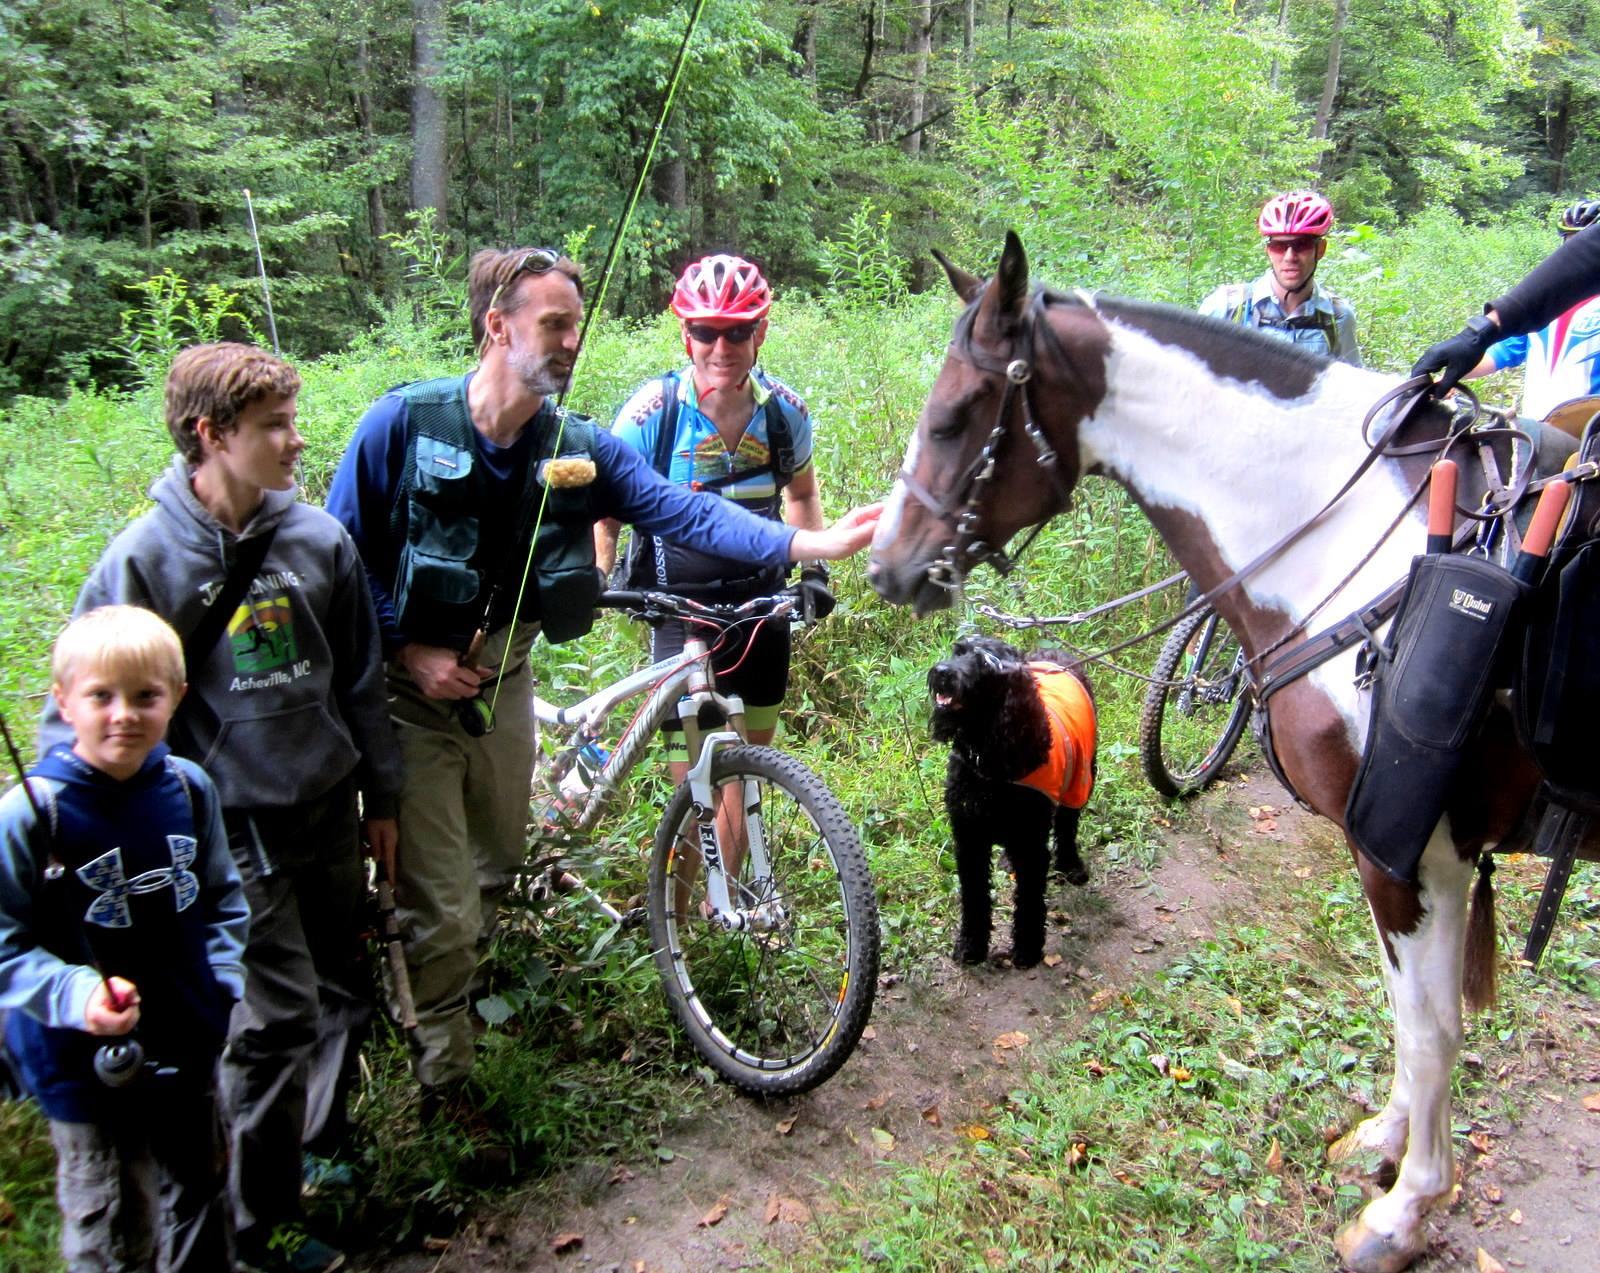 North Mills River Sharing Trails_credit Christine Vigue of Back Country Horsemen of Pisgah_3